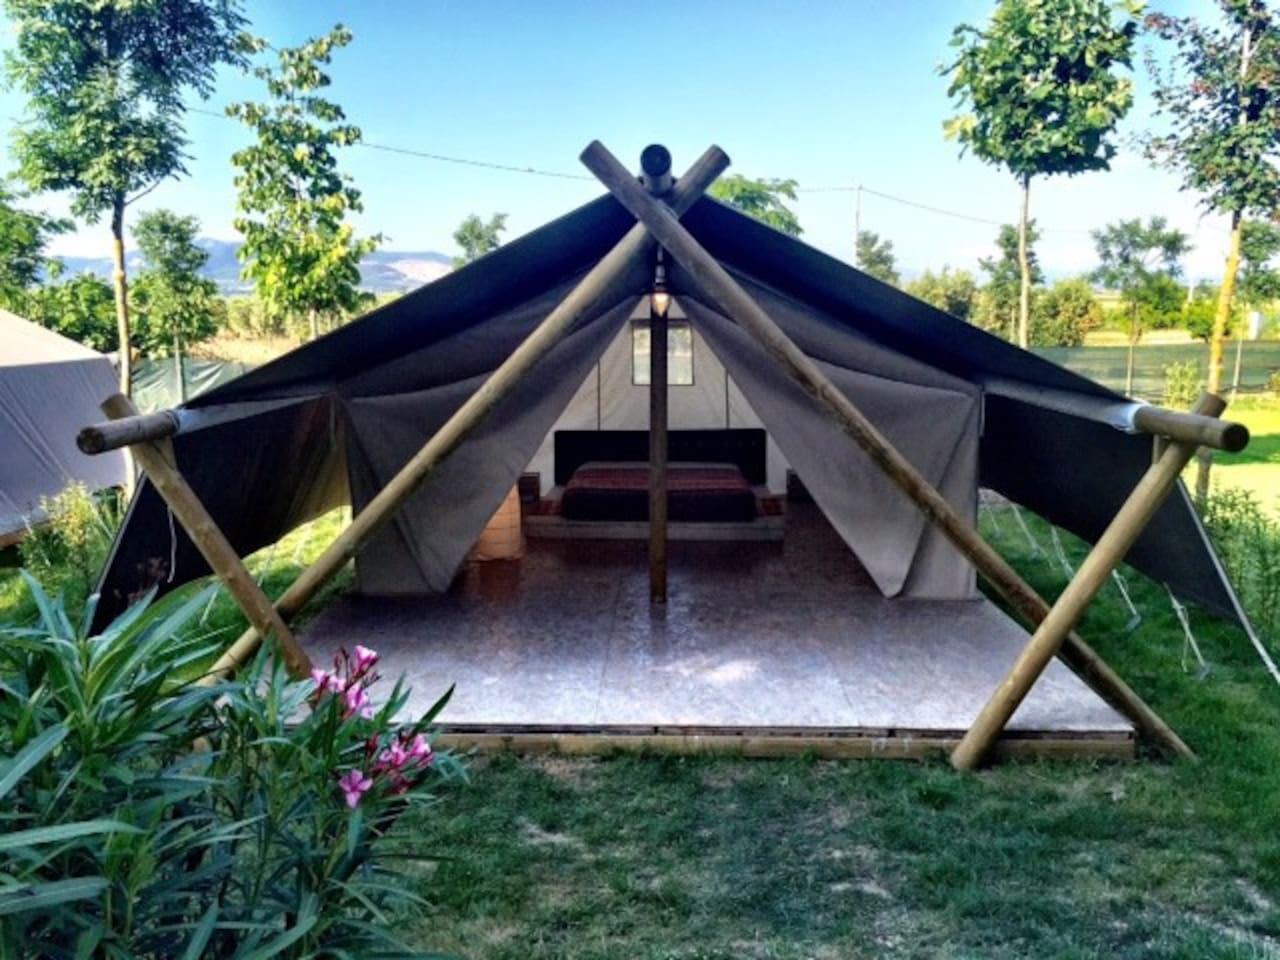 Le nostre maxi tende Lounge